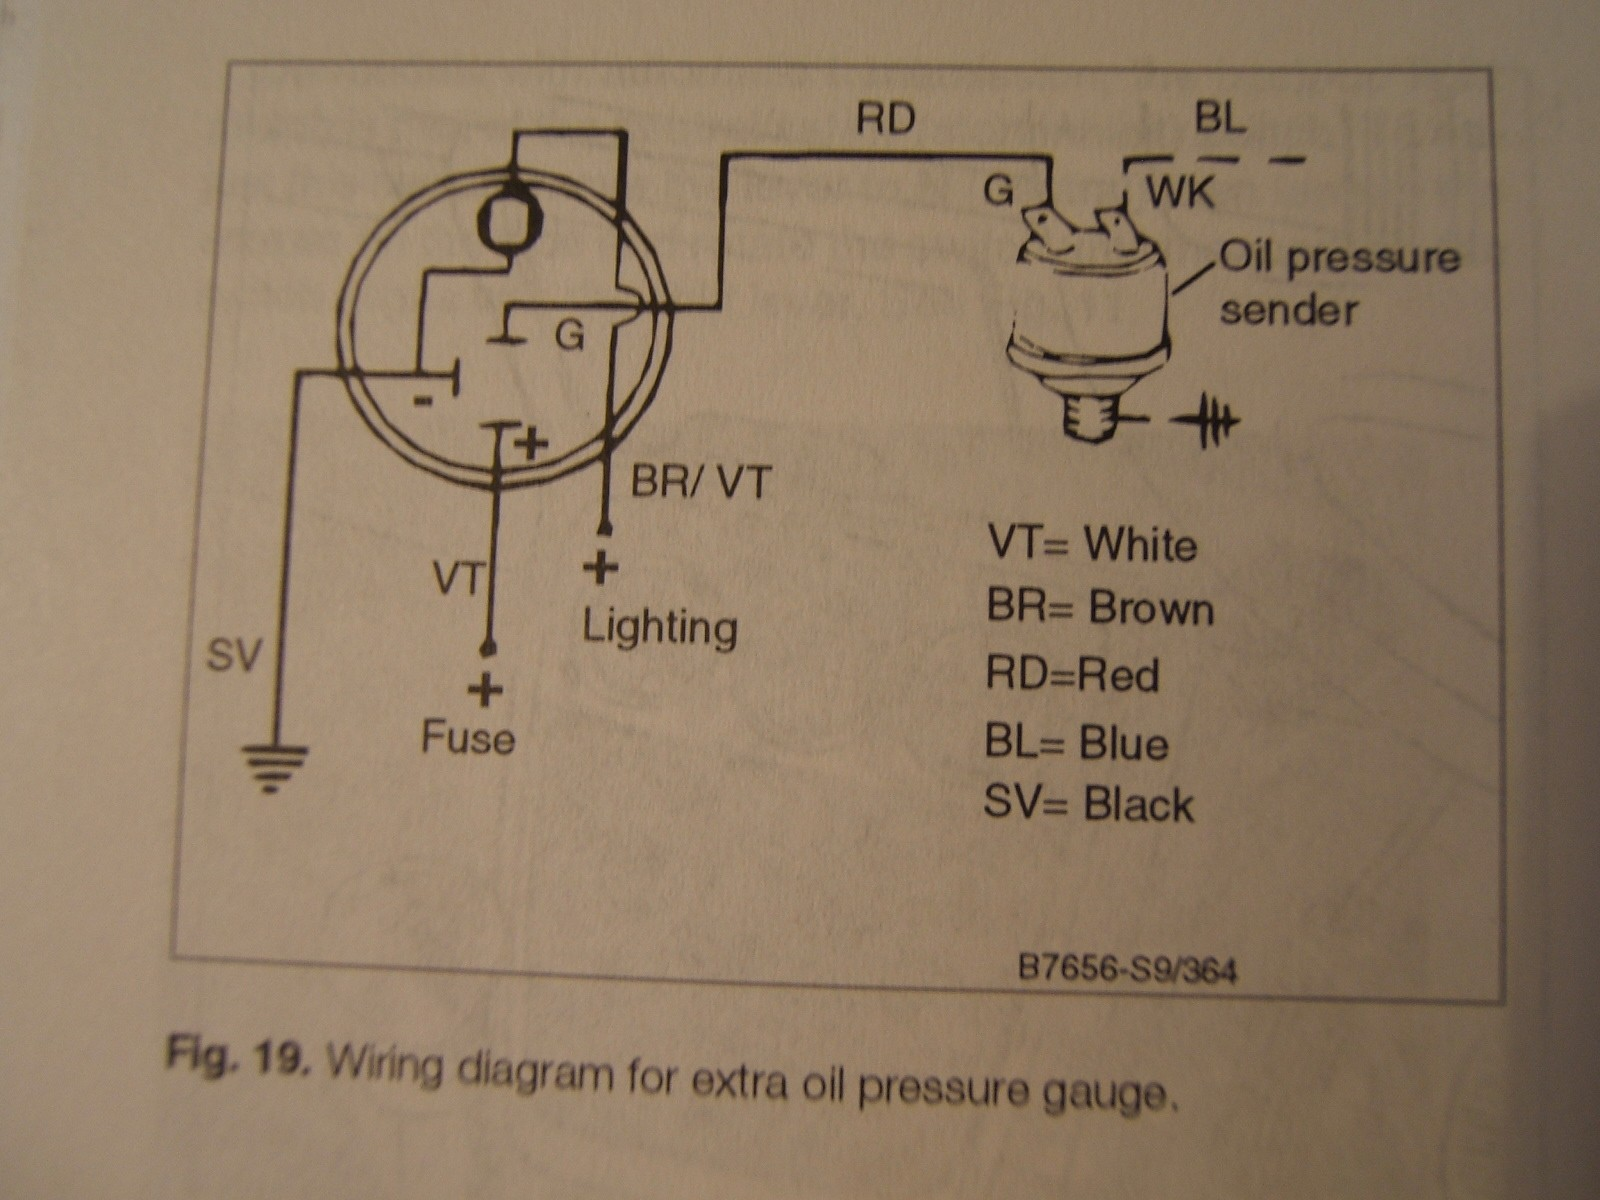 Vdo Oil Pressure Gauge Wiring Instructions Fe 4727] Prosport Oil Pressure Gauge Wiring Diagram Prosport Of Vdo Oil Pressure Gauge Wiring Instructions Wiring Diagram Oil Pressure 1992 Lumina